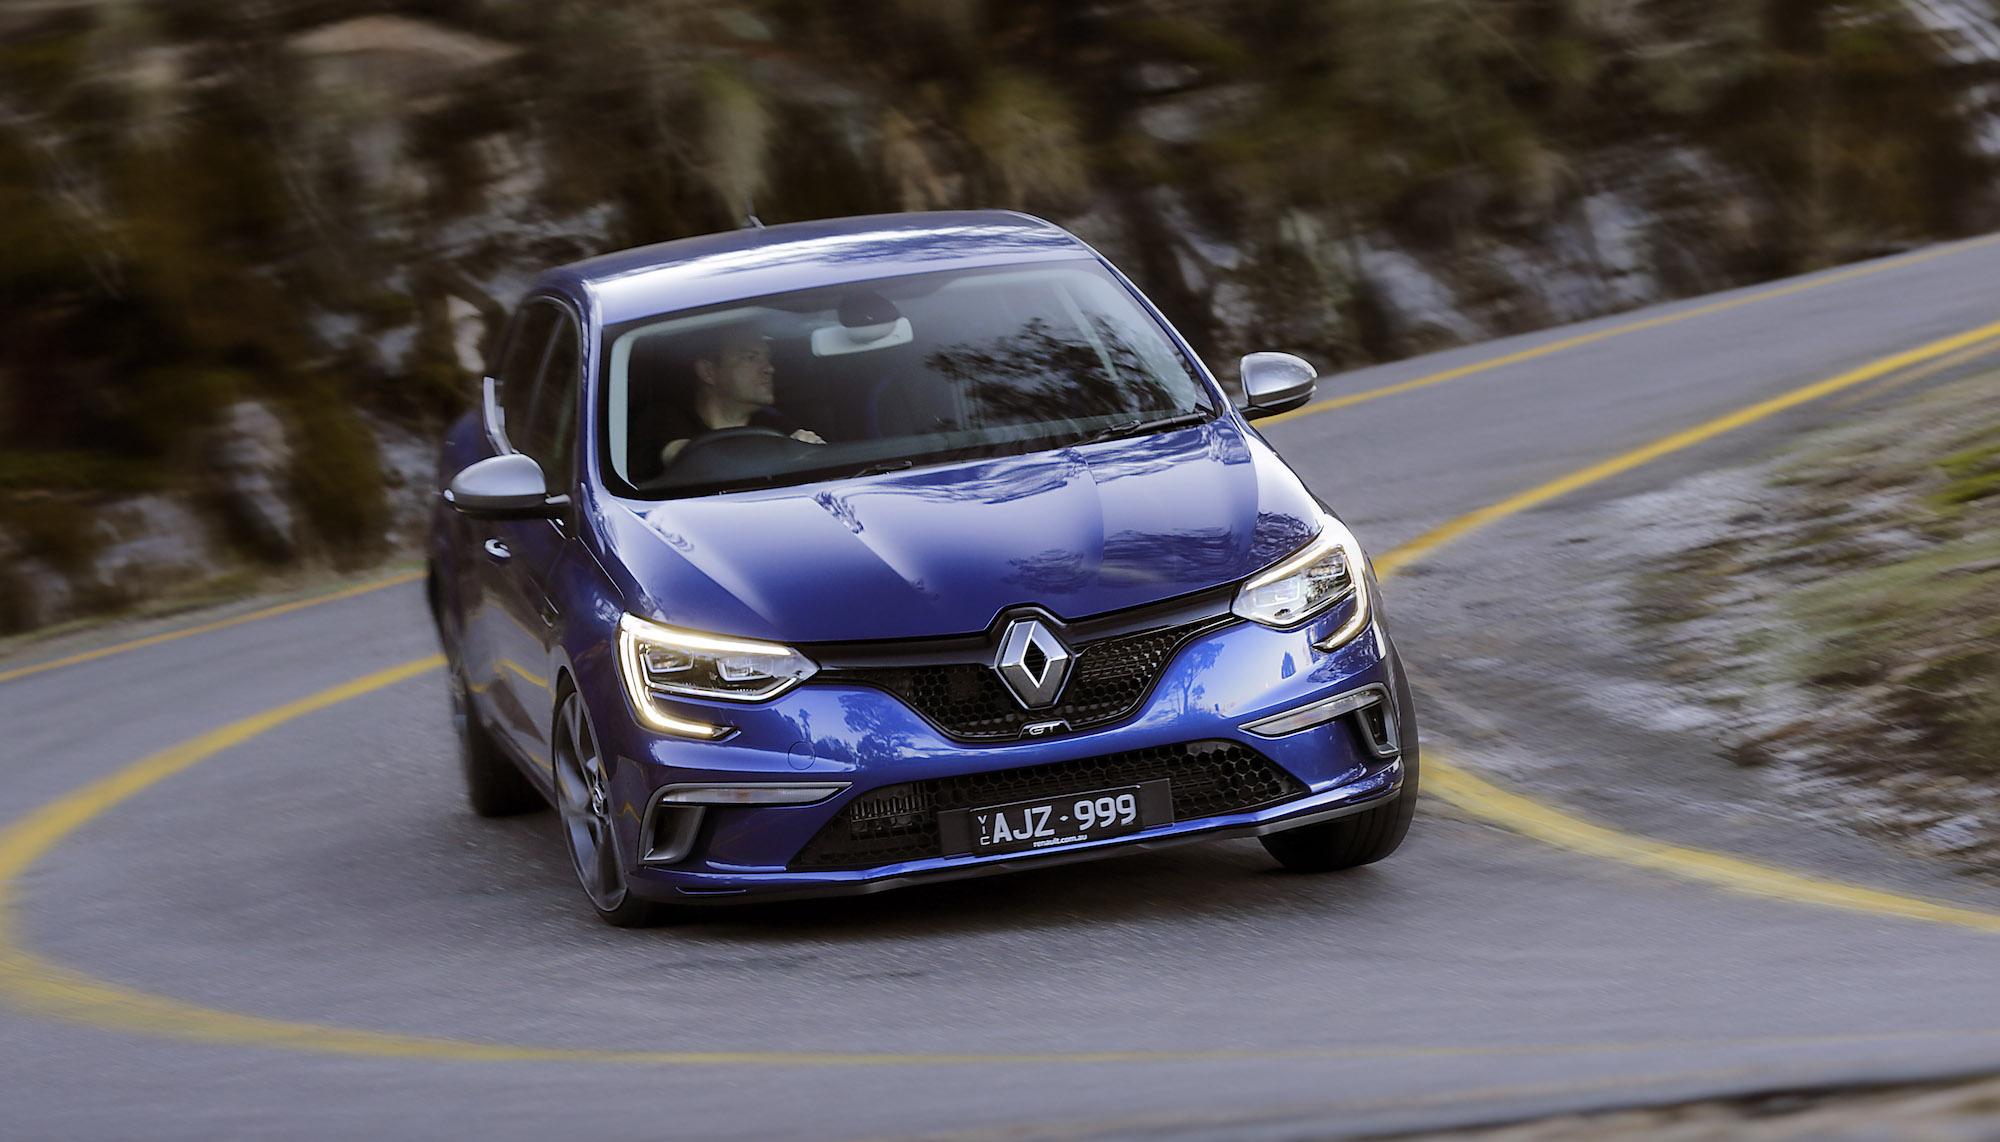 Renault Megane GT photo 170356